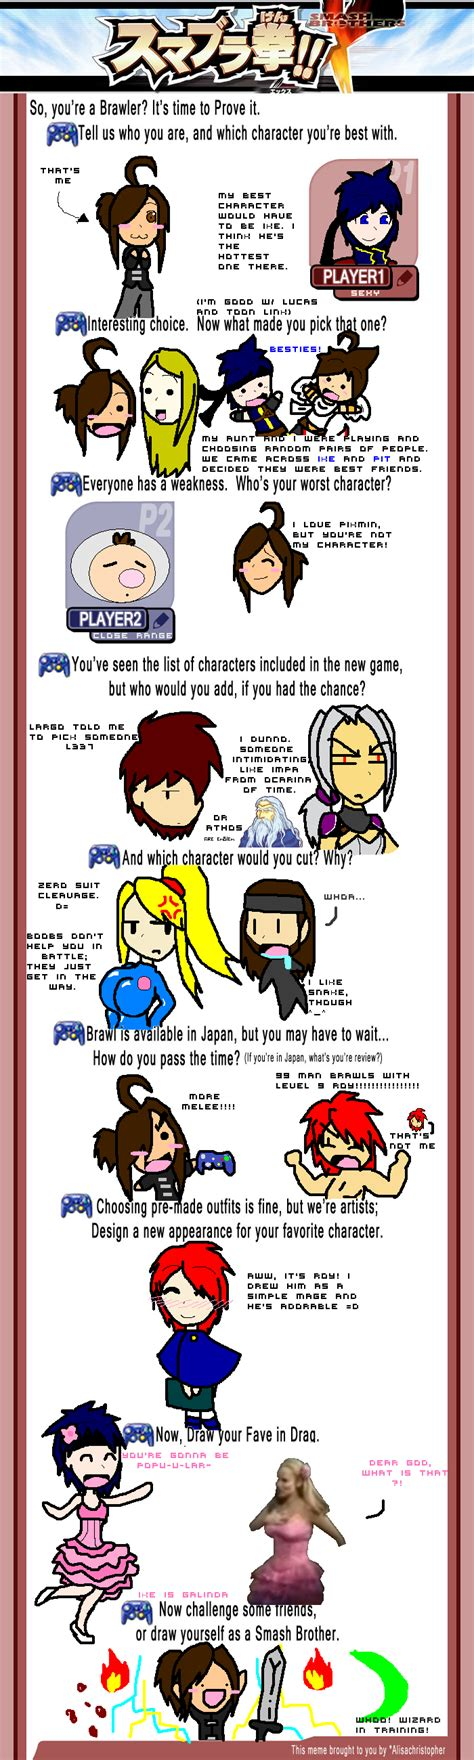 Super Smash Bros Meme - super smash bros brawl meme by itachixkisame on deviantart